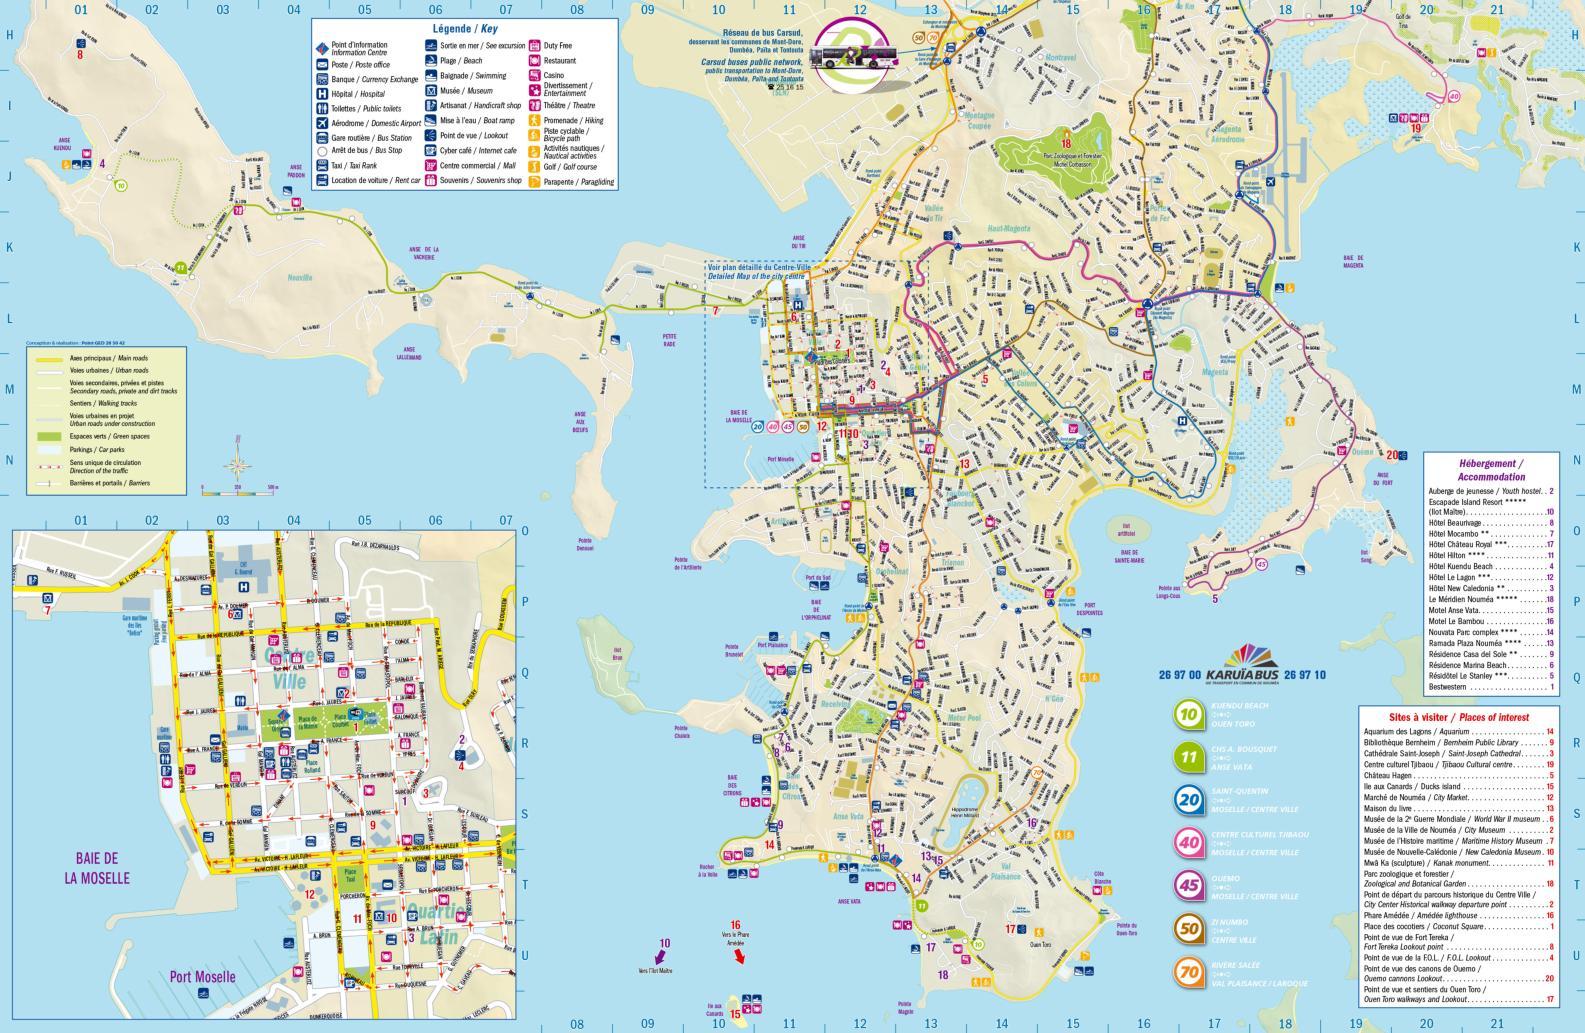 map of noumea plan de noum a calameo downloader